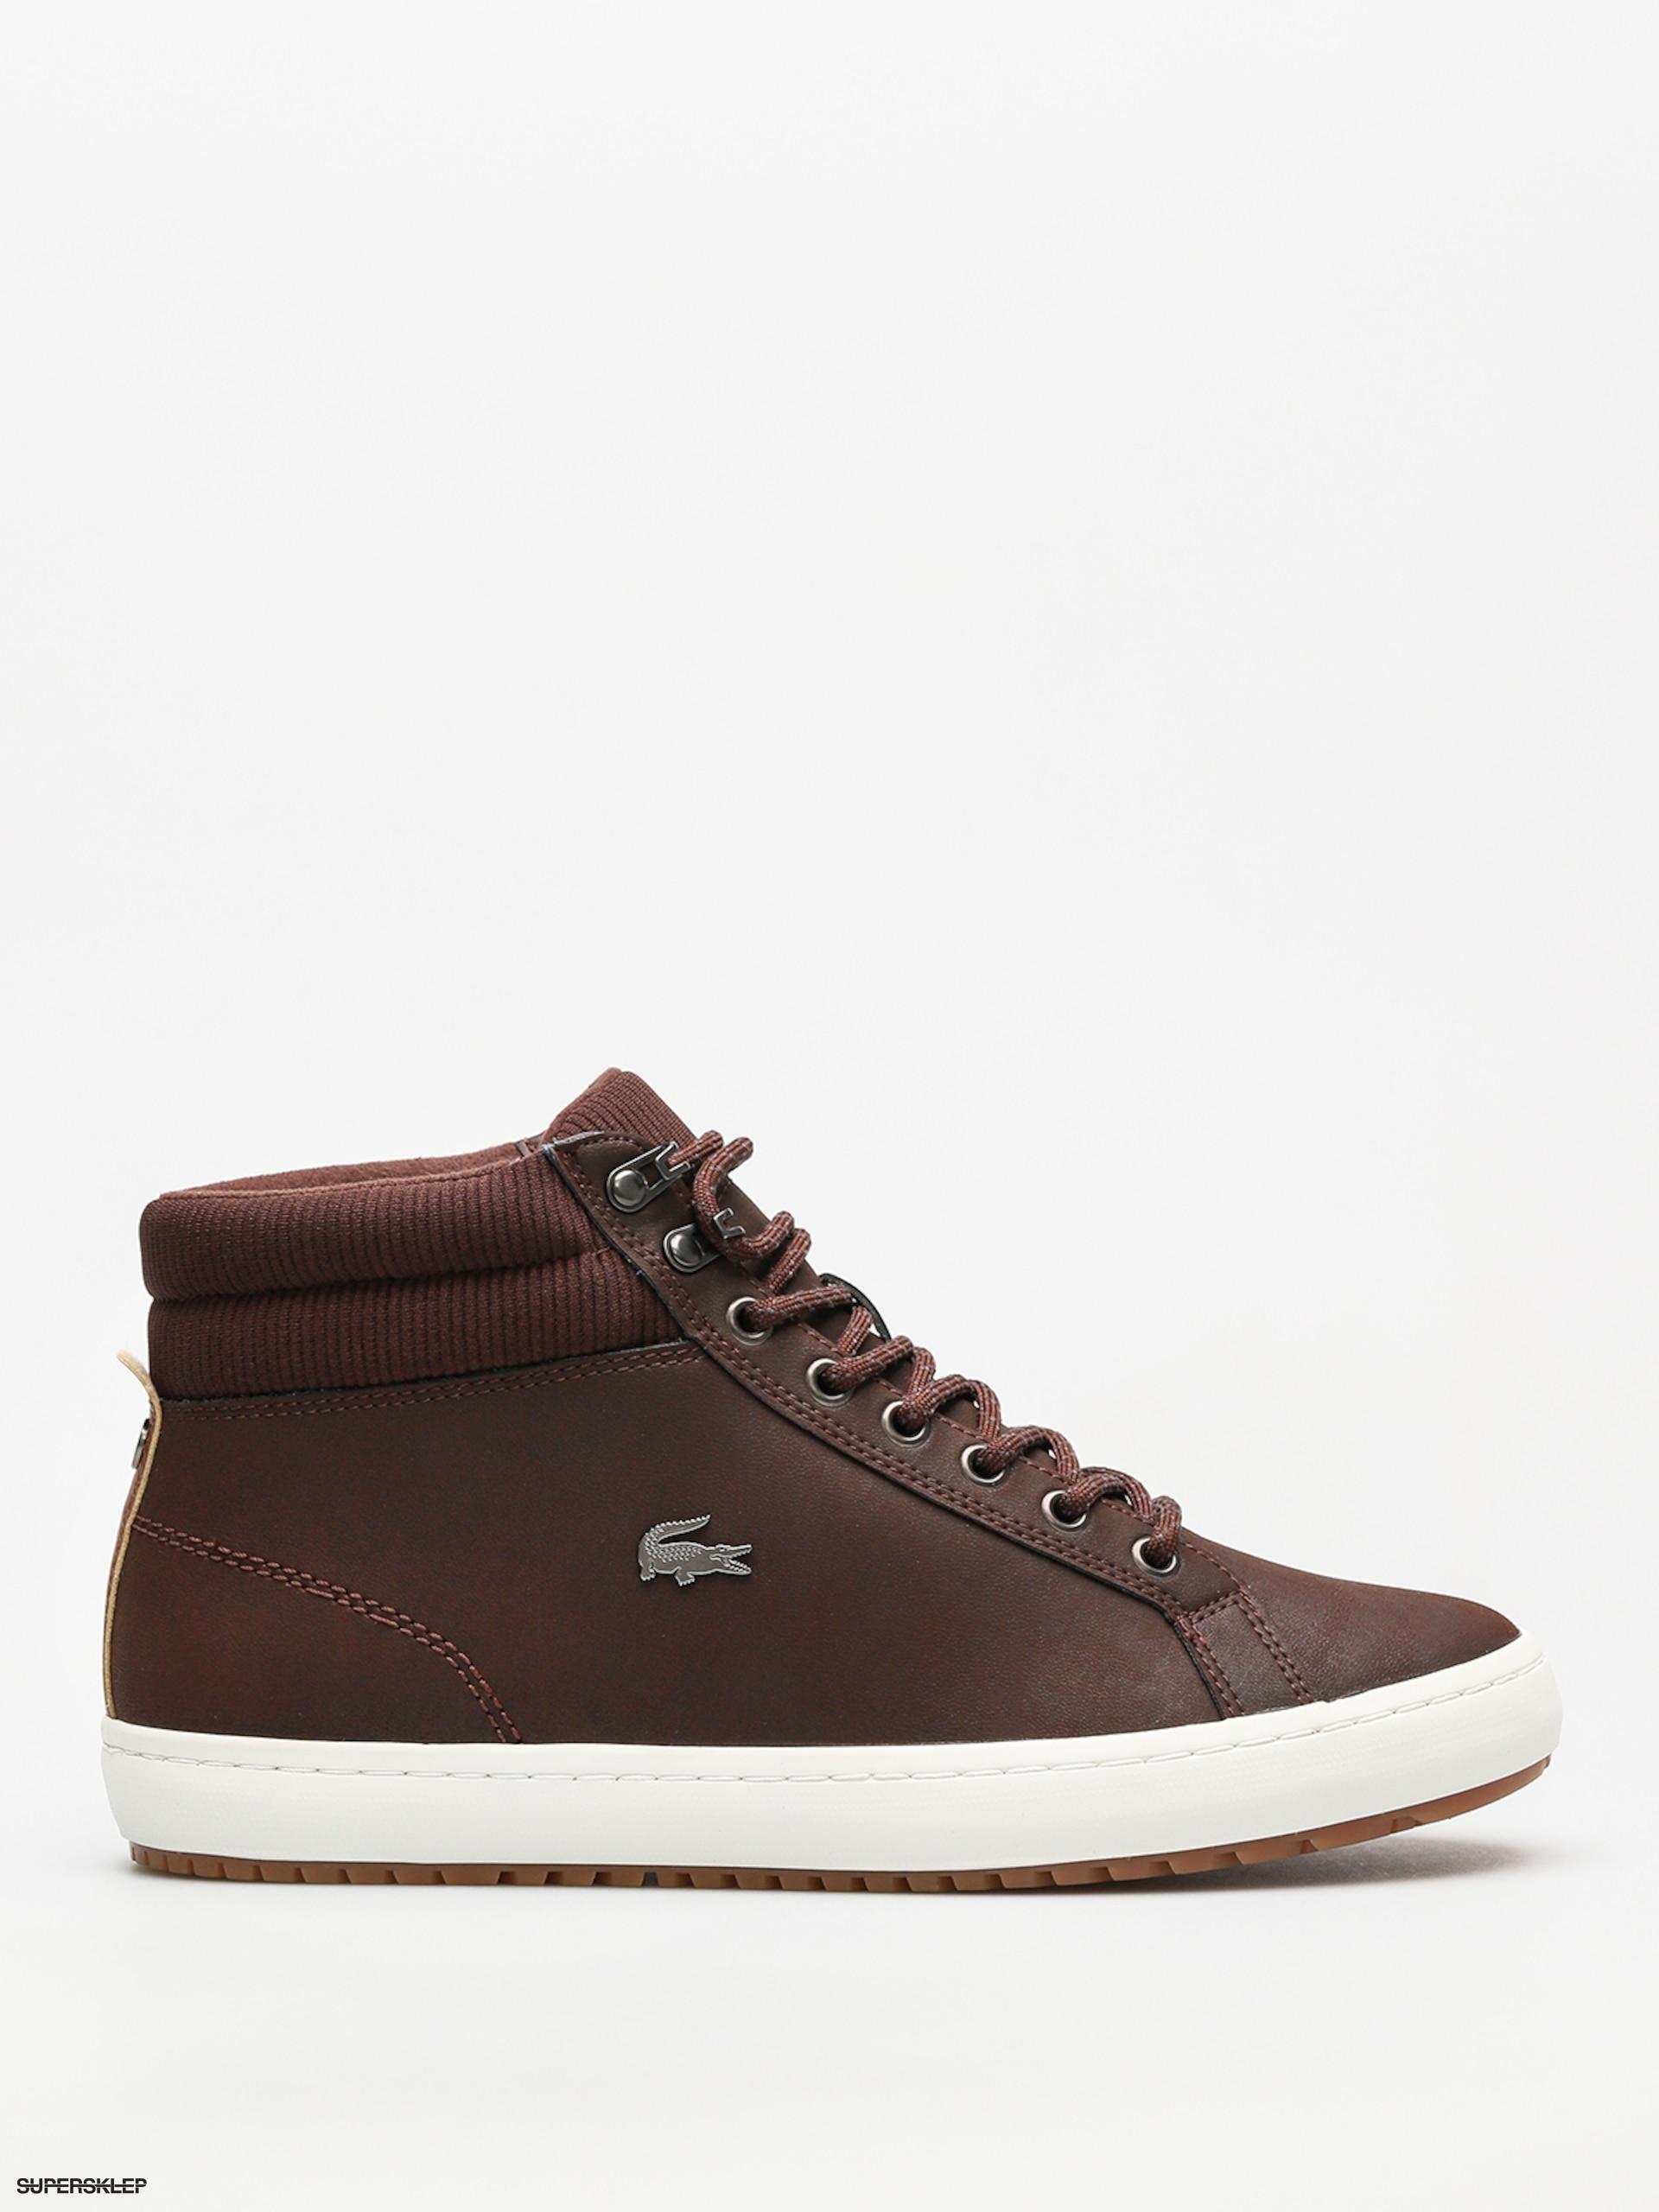 fbddac81d294a Buty Lacoste Straightset Insulac 3181 (dark brown/dark brown)